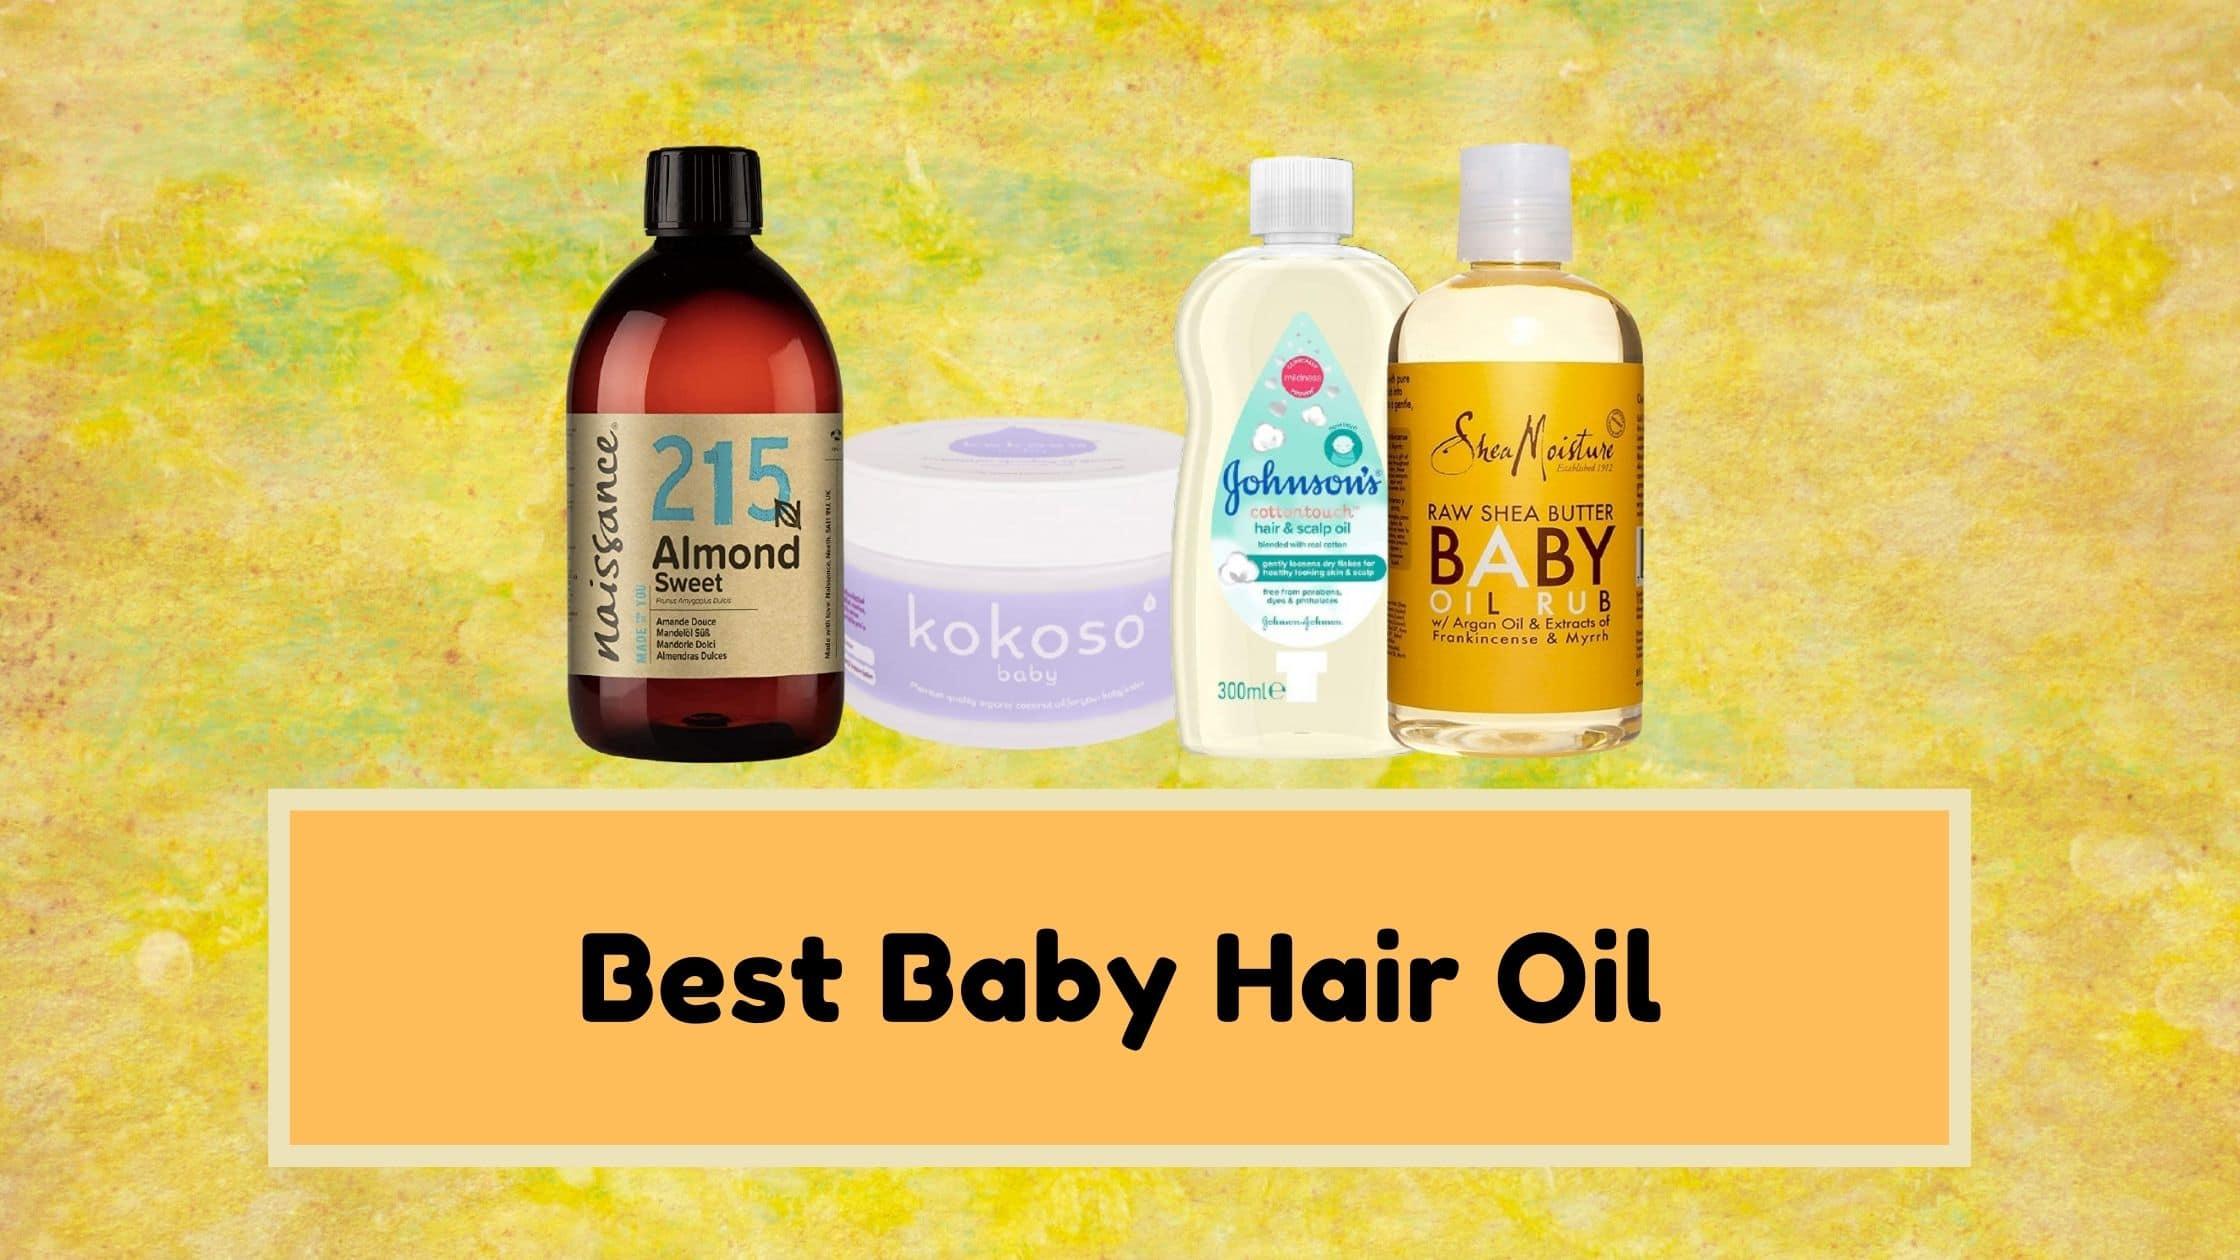 Best Baby Hair Oil